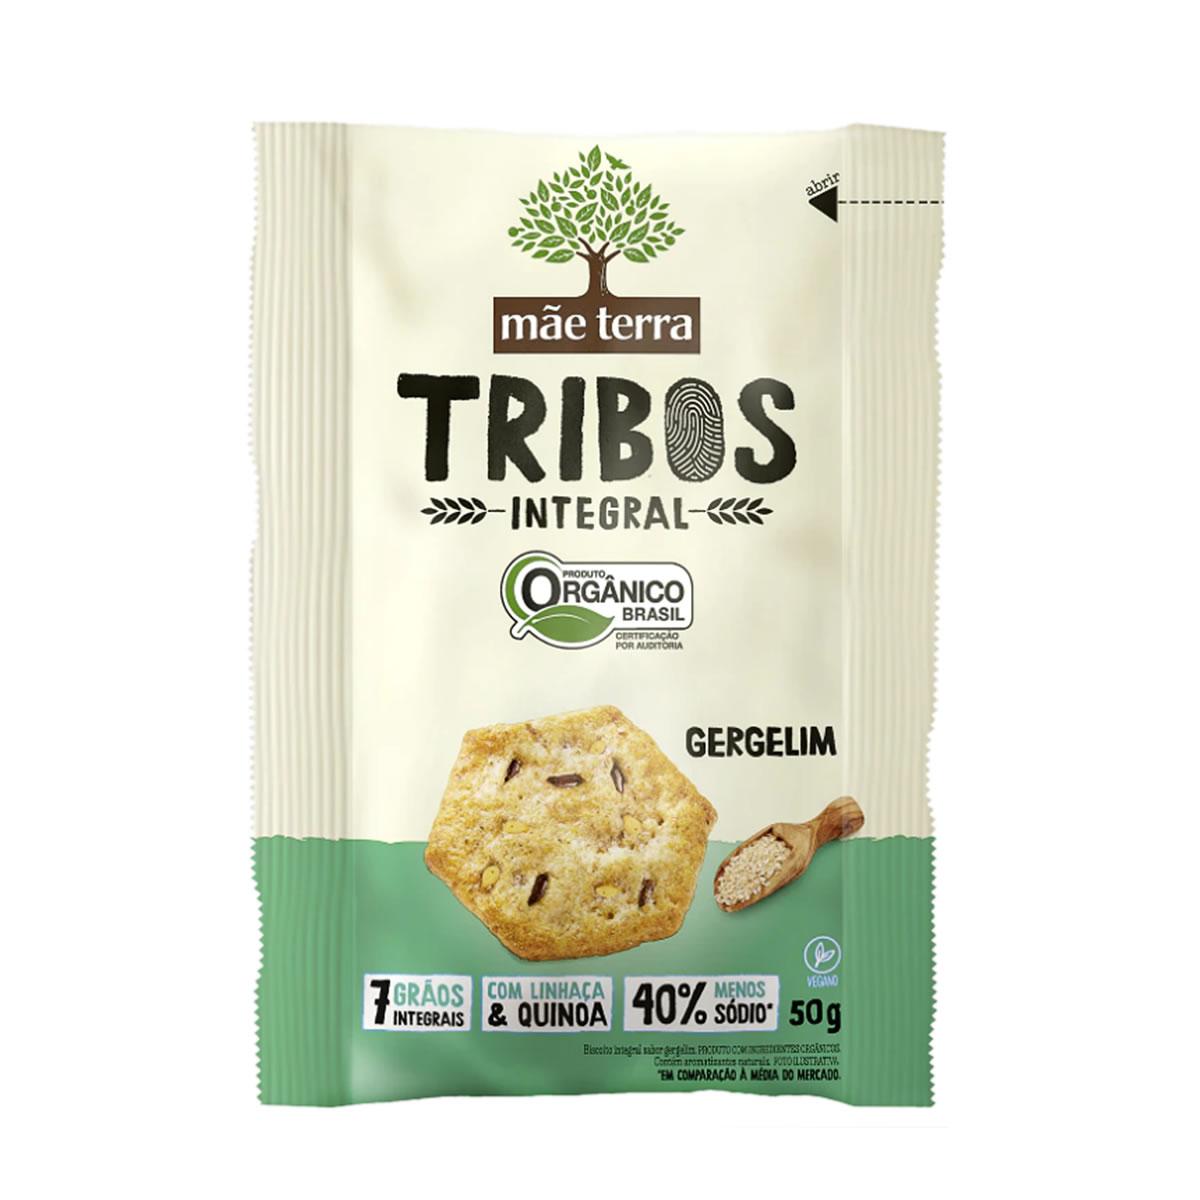 Snack Tribos Orgânico Gergelim 50g - Mãe Terra